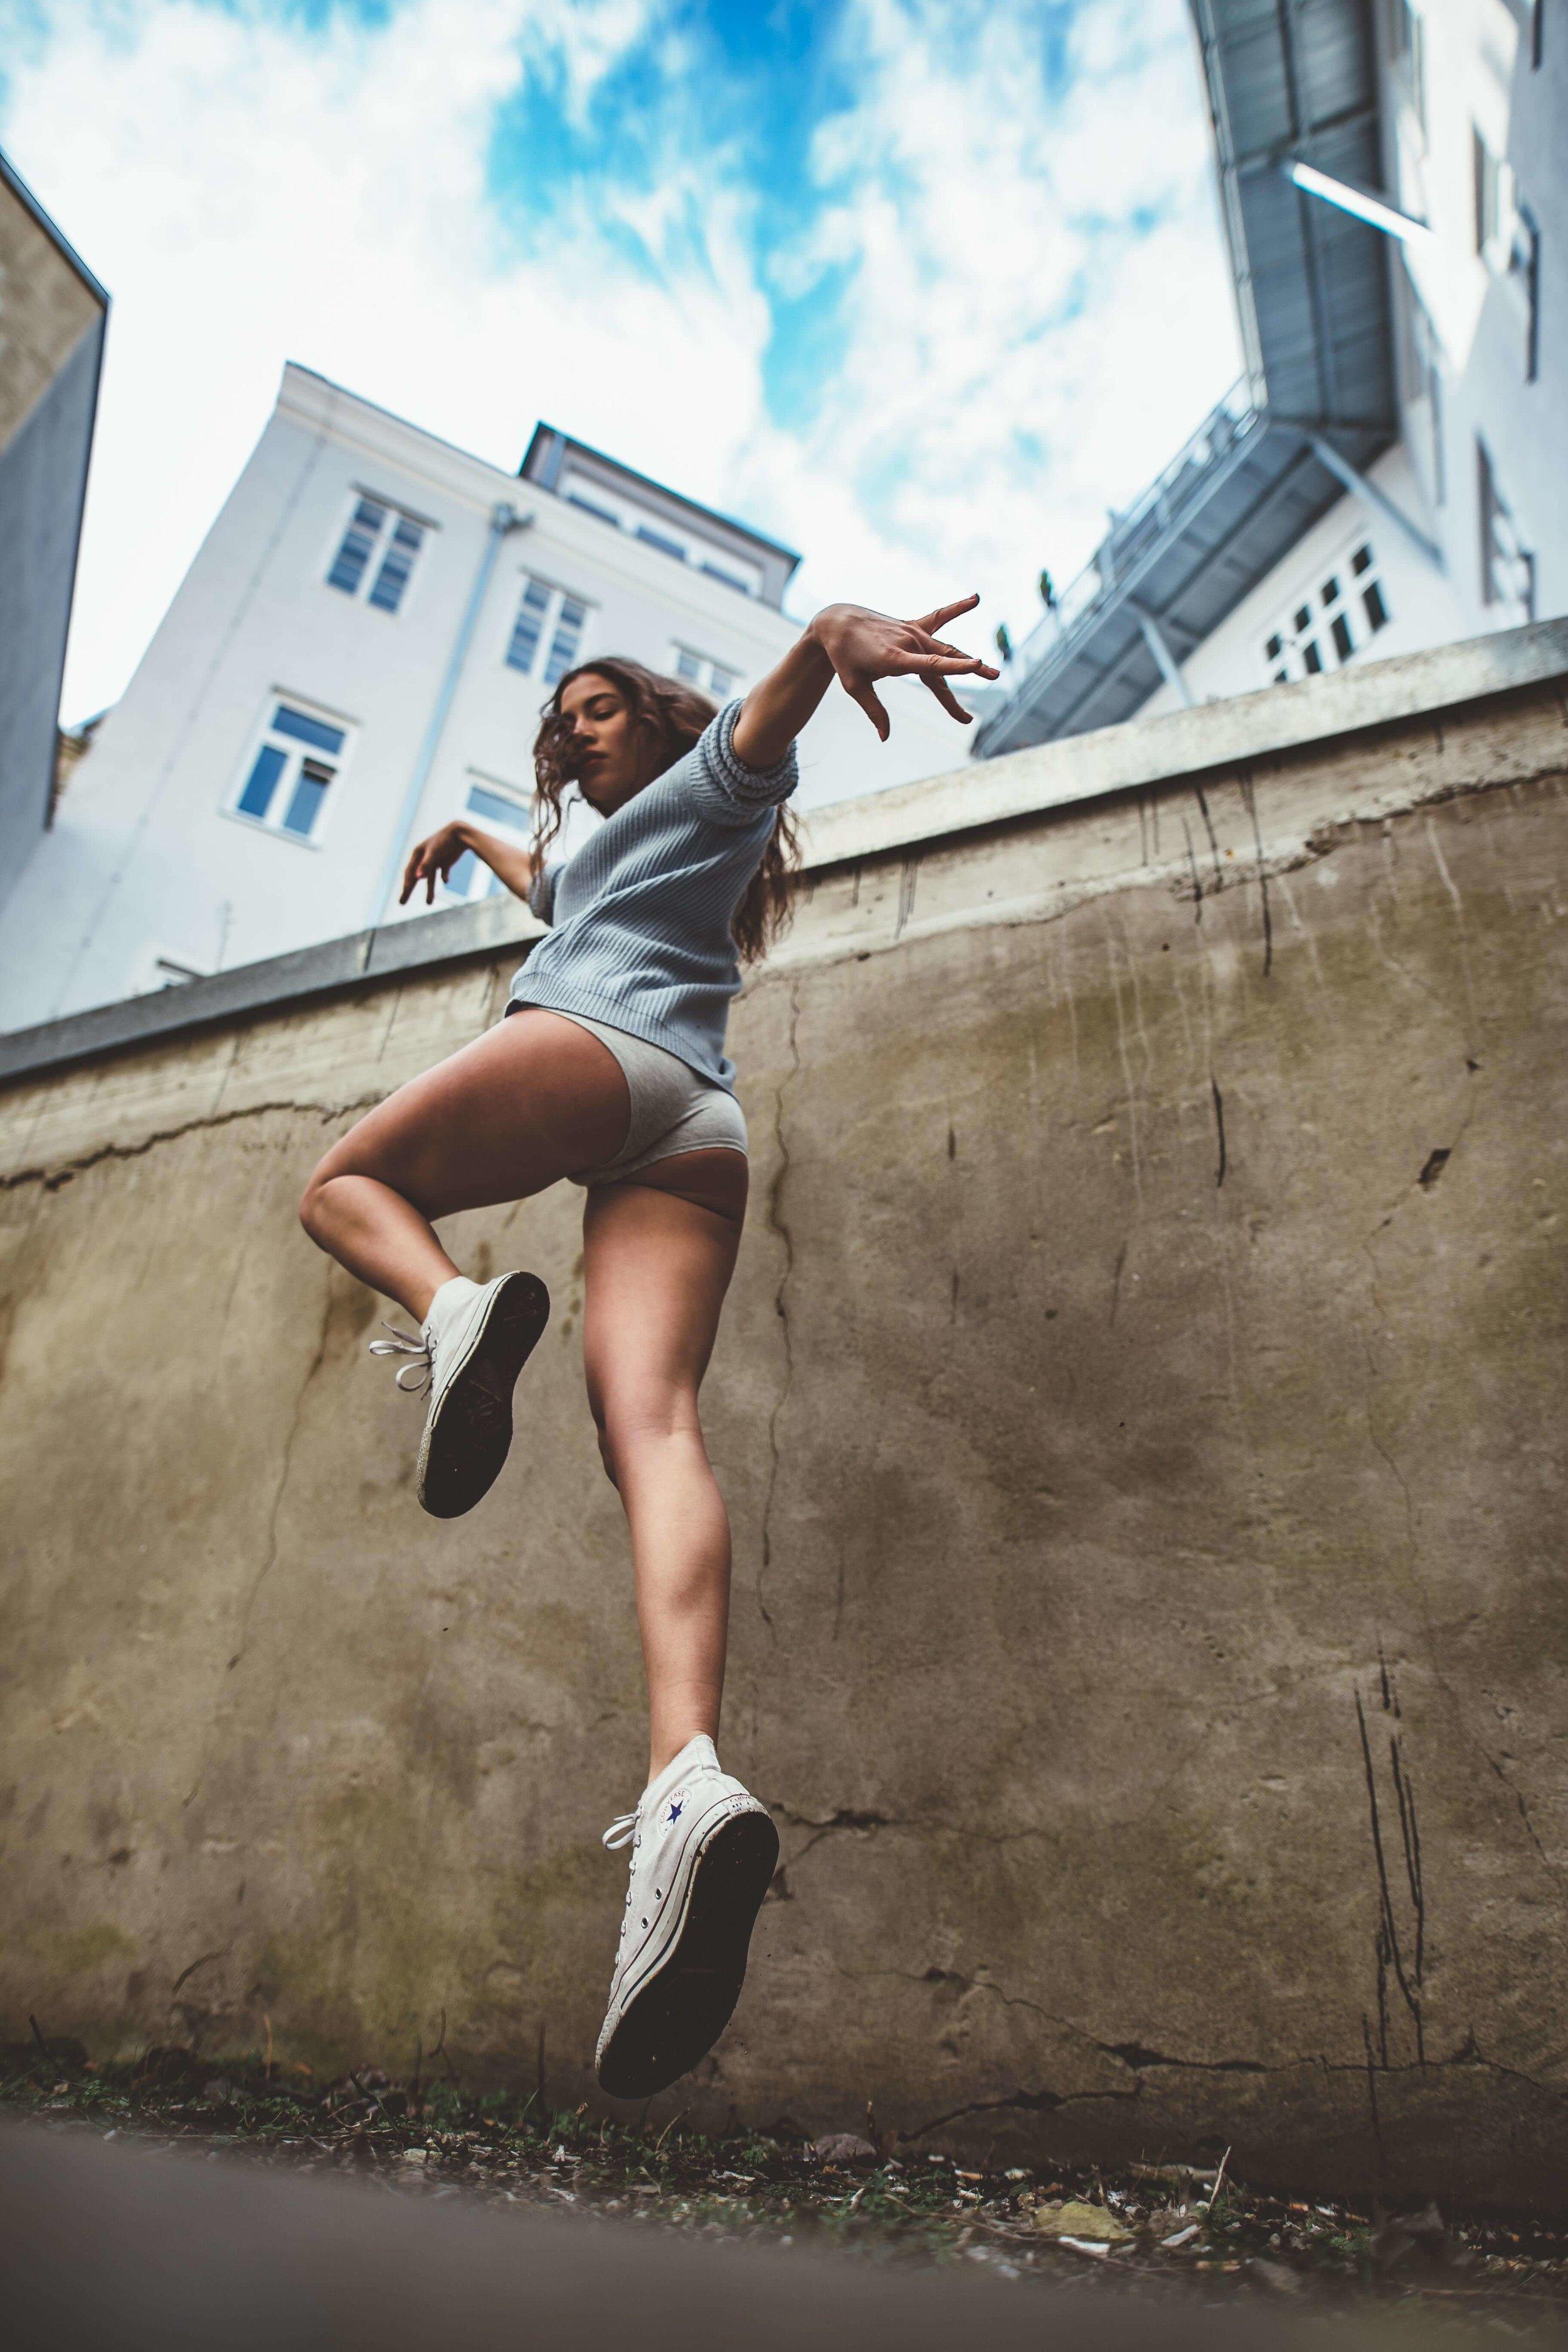 Lisa in Vienna with LA Photographer Joe Venuto-5883-min.jpg